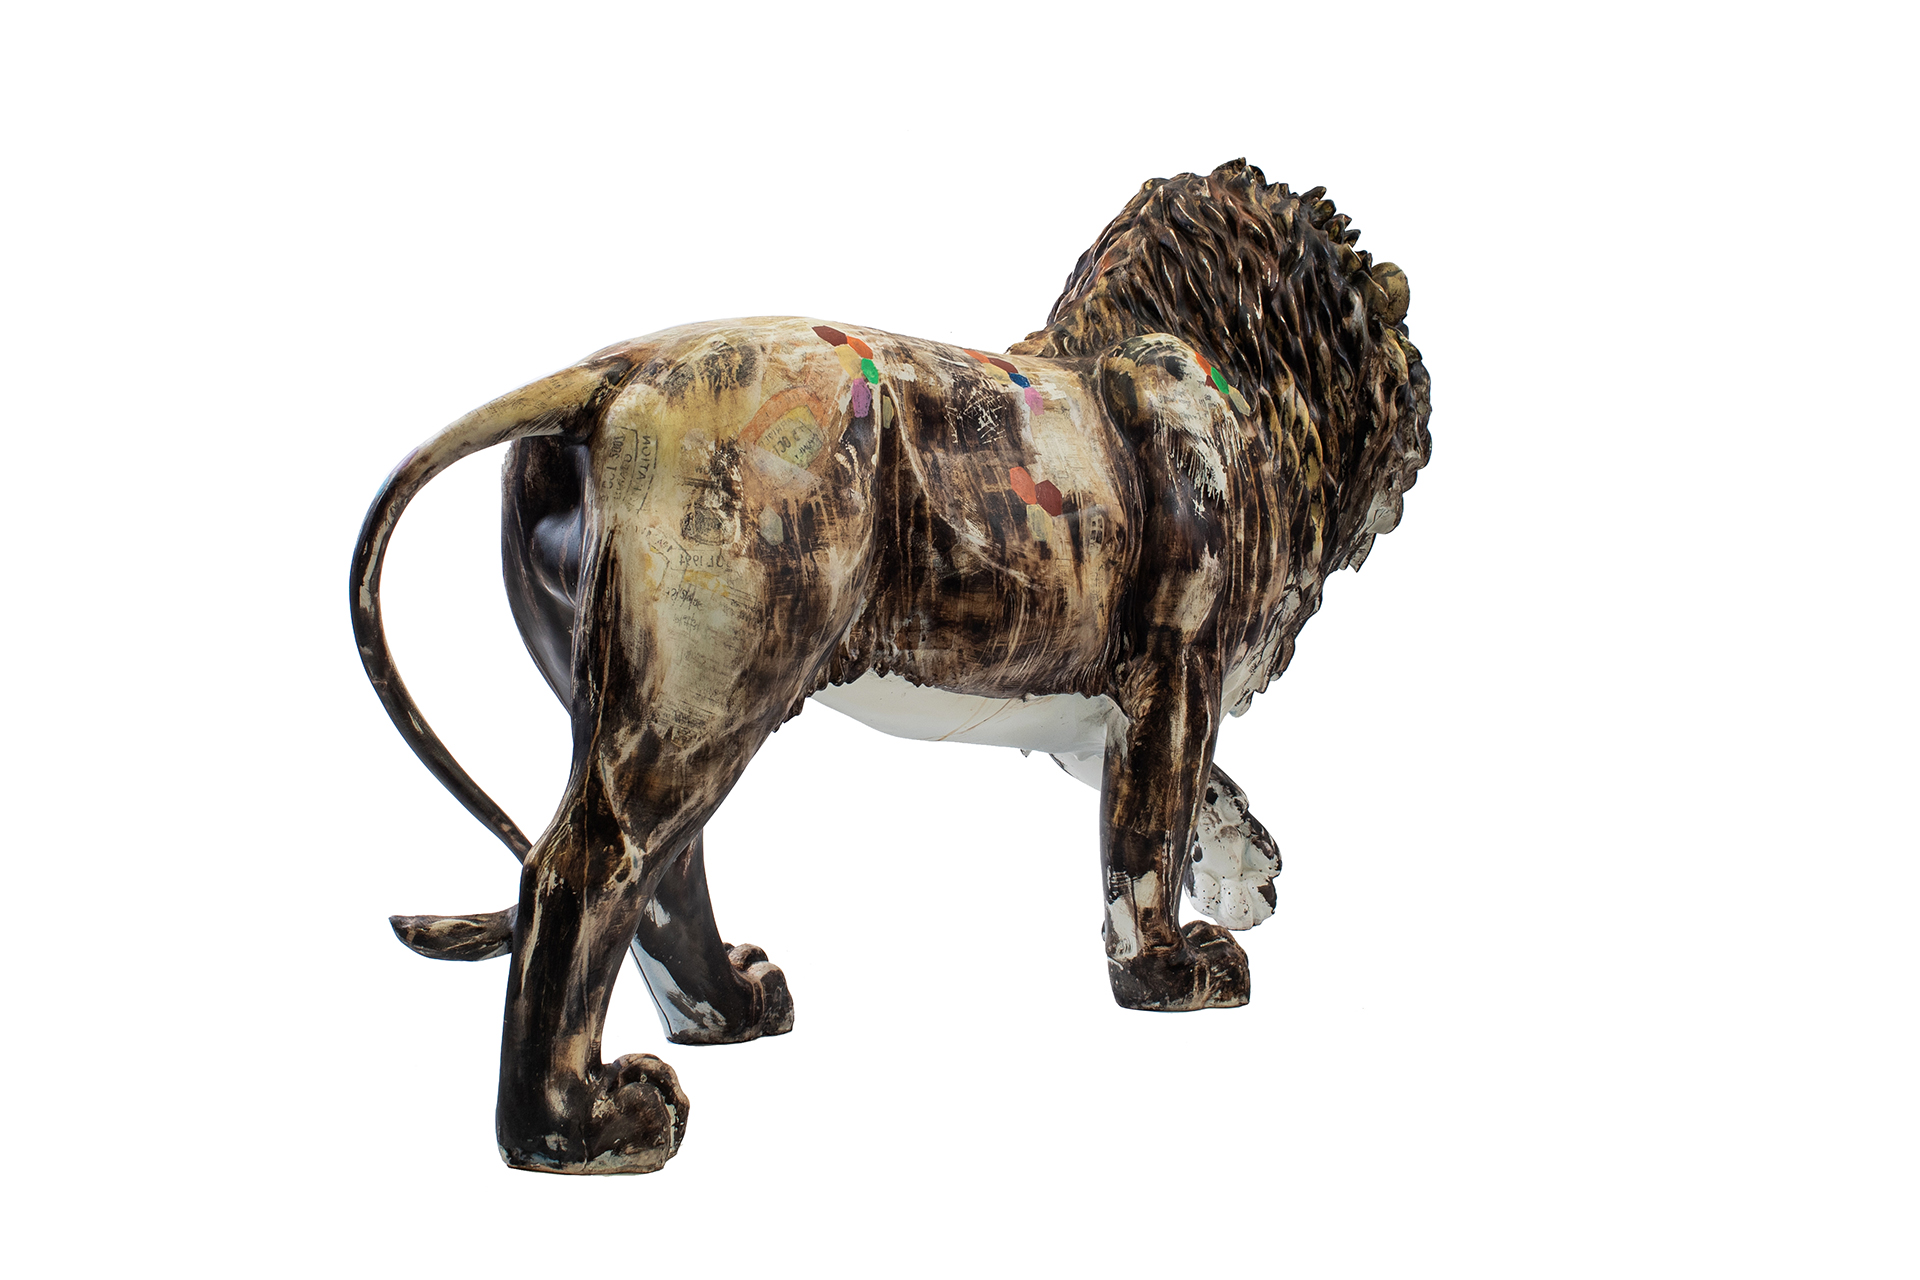 Tusk Lion Trail 2021 - Paul Onditi - Generously sponsored by Ninety One Image Credit: Nick Andrews